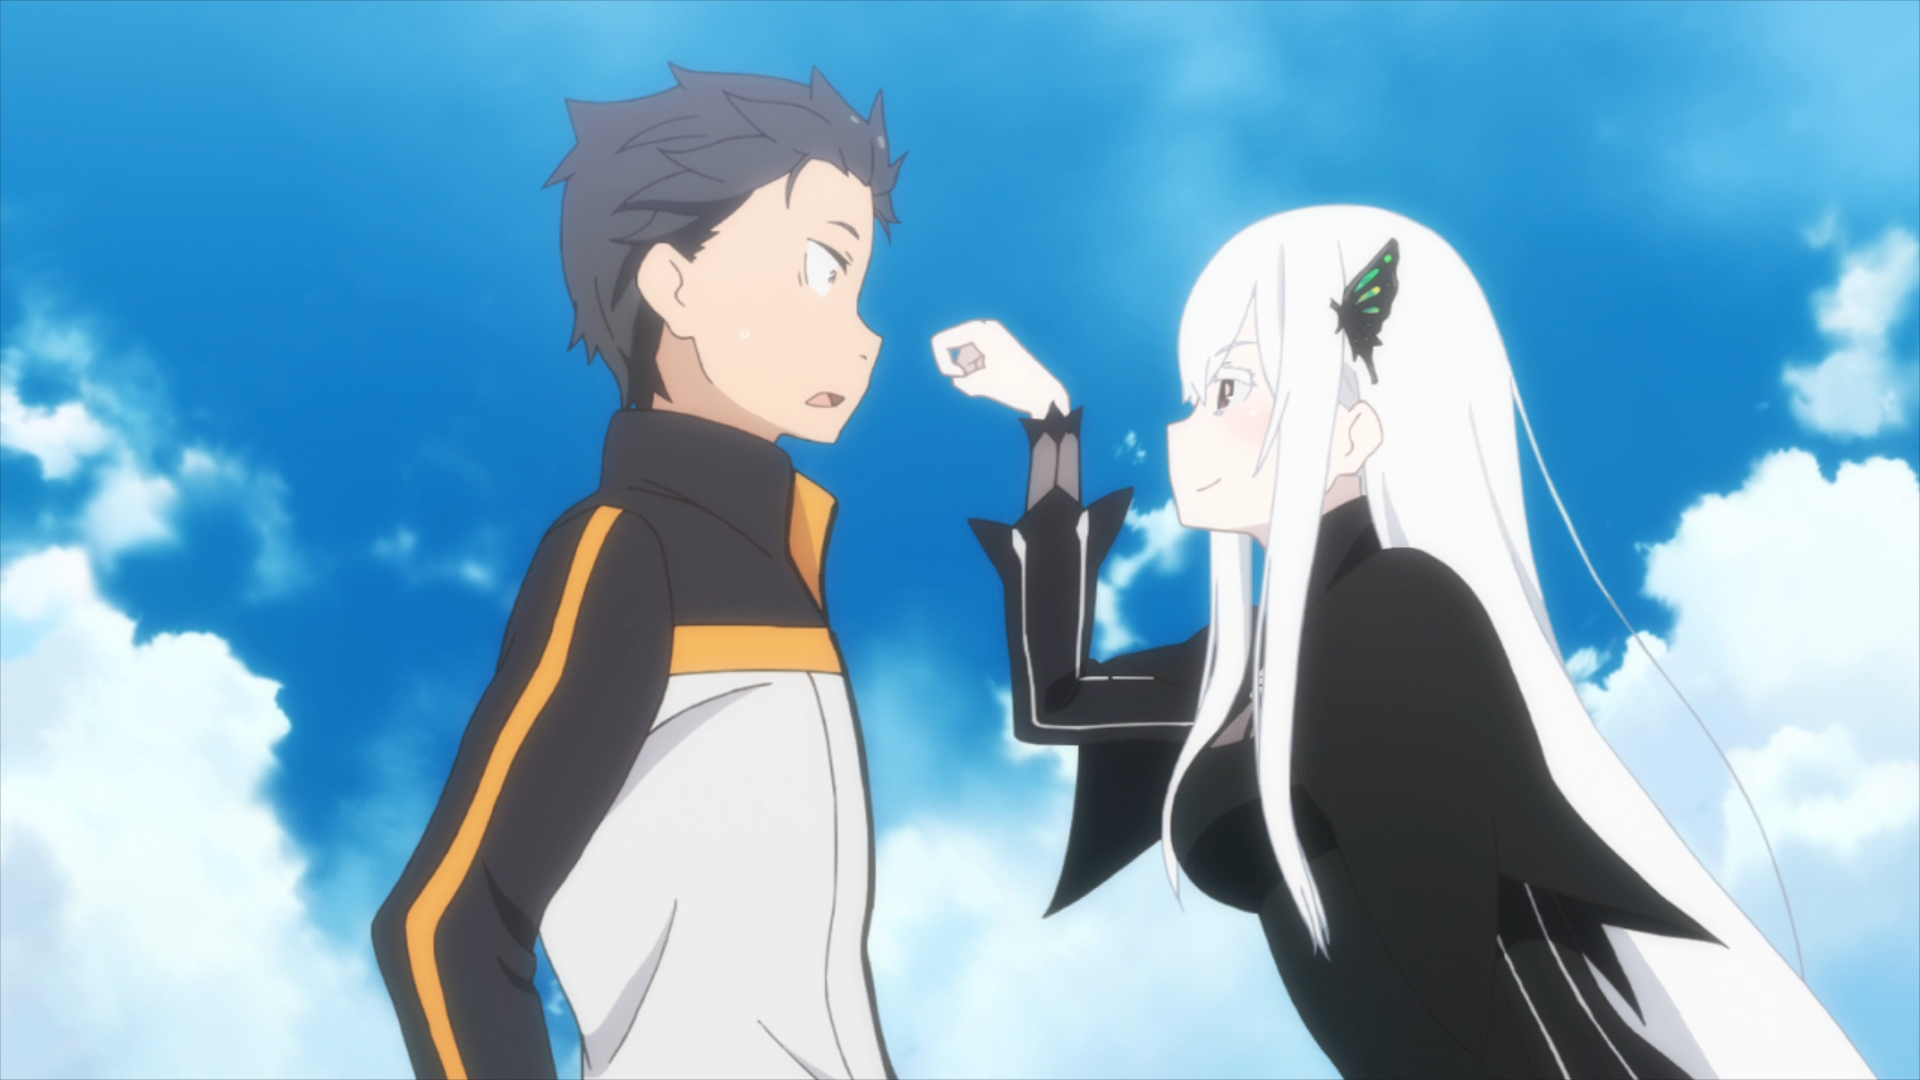 Review – Re:Zero S2 Episode 03